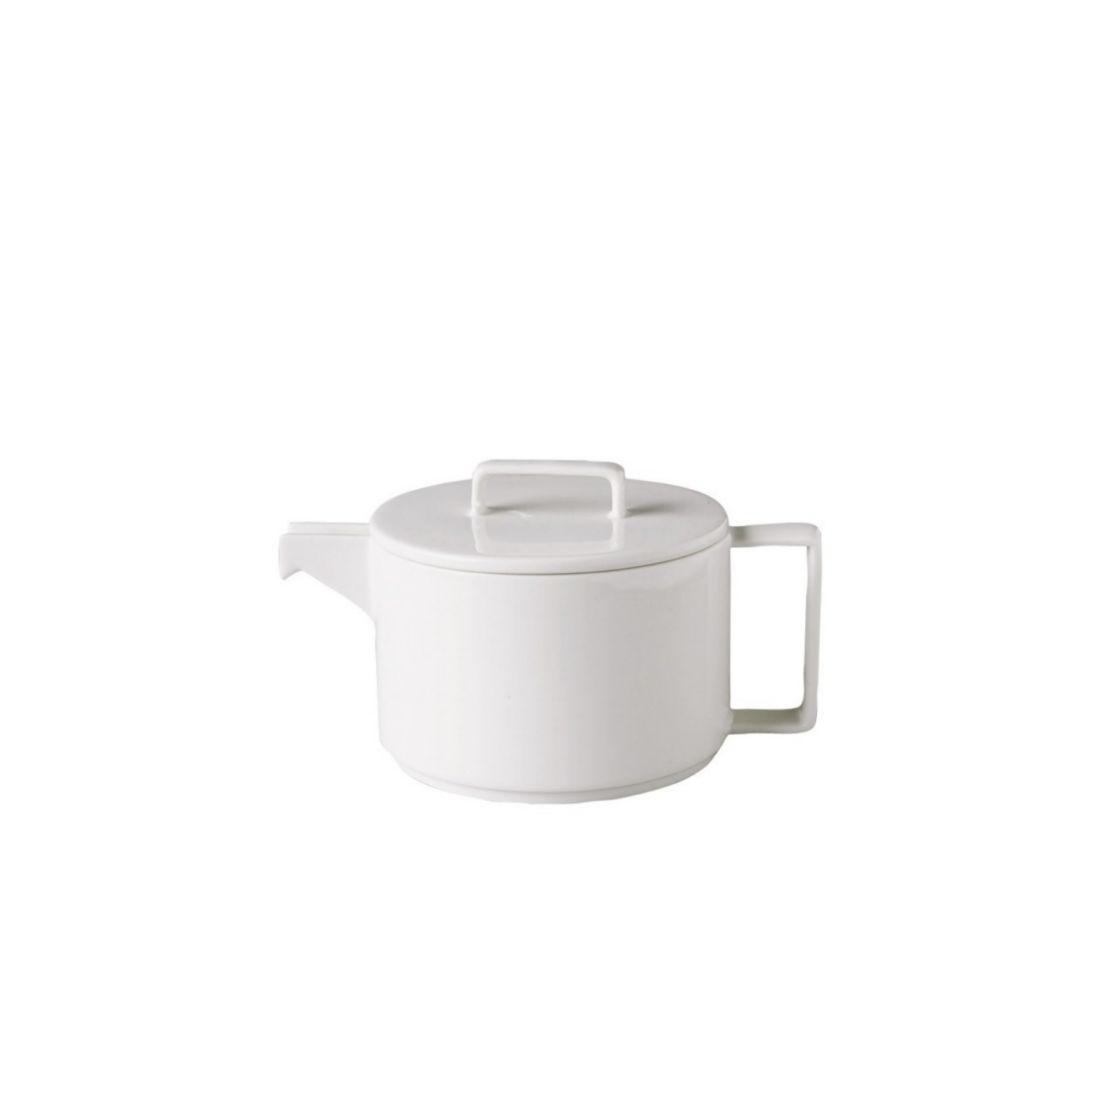 RAK Konvice na čaj s víčkem 400 ml Nordic